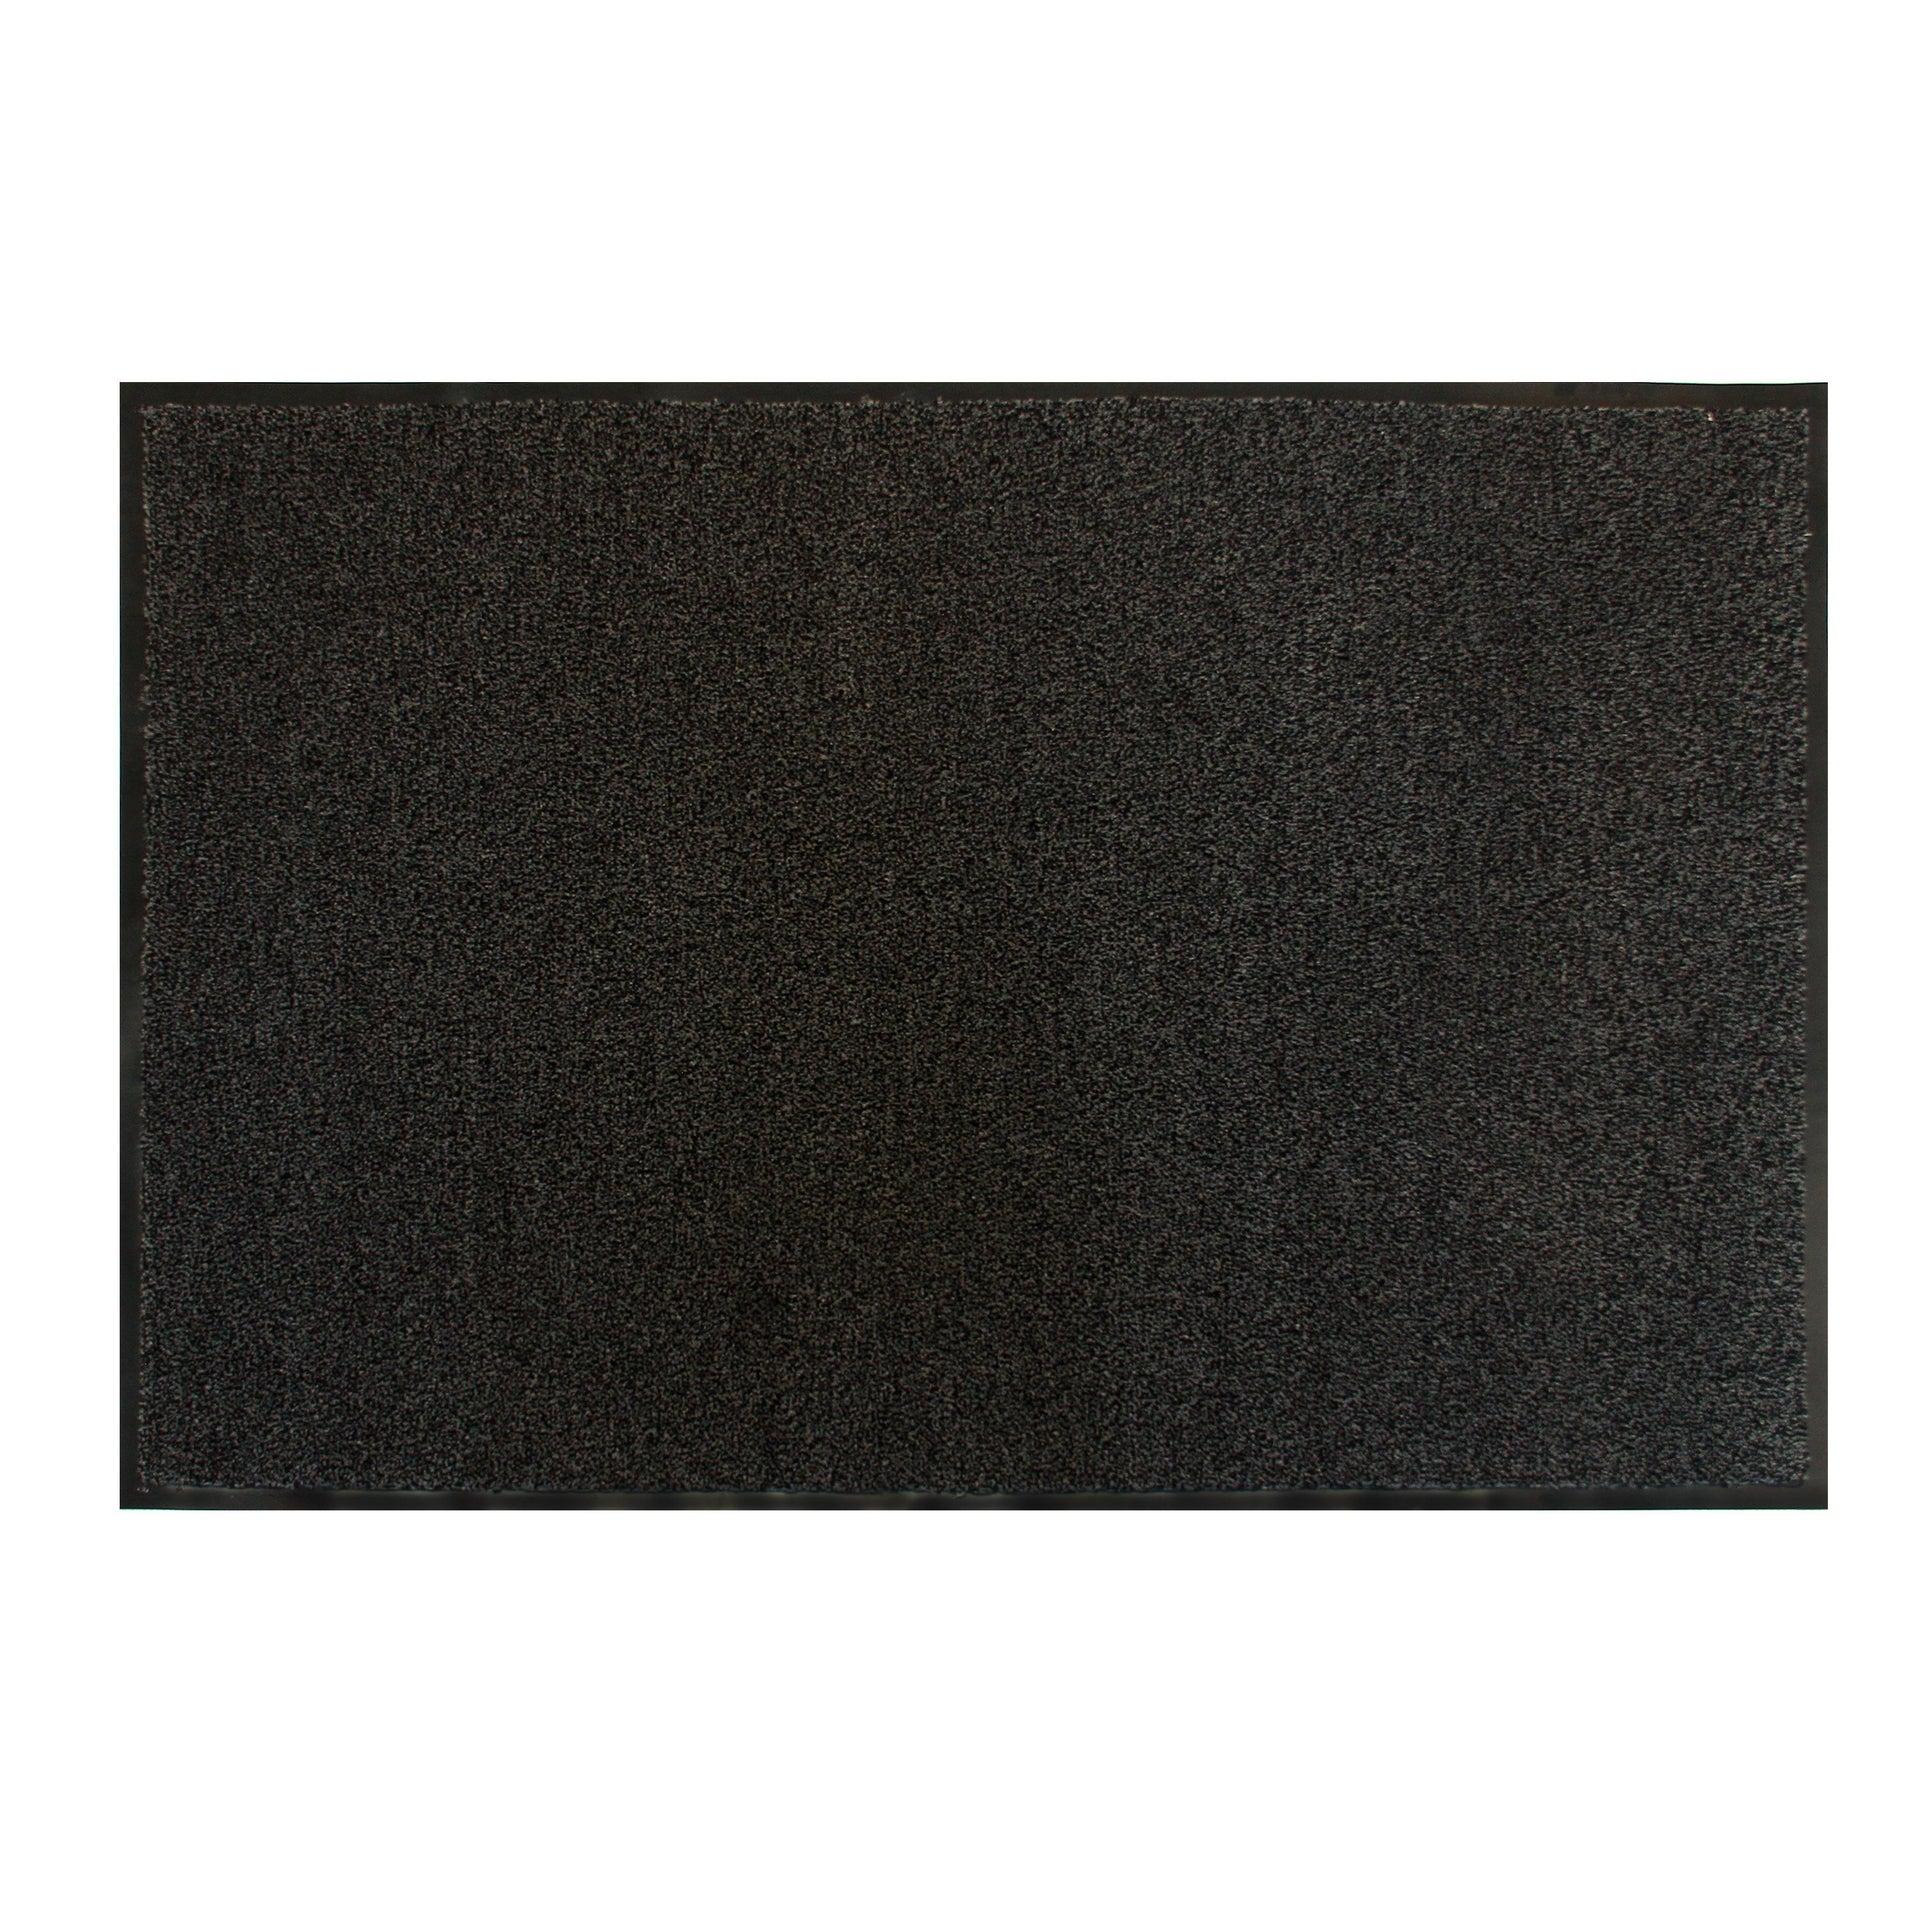 Zerbino Gabriel in polipropilene grigio 90x120 cm - 2